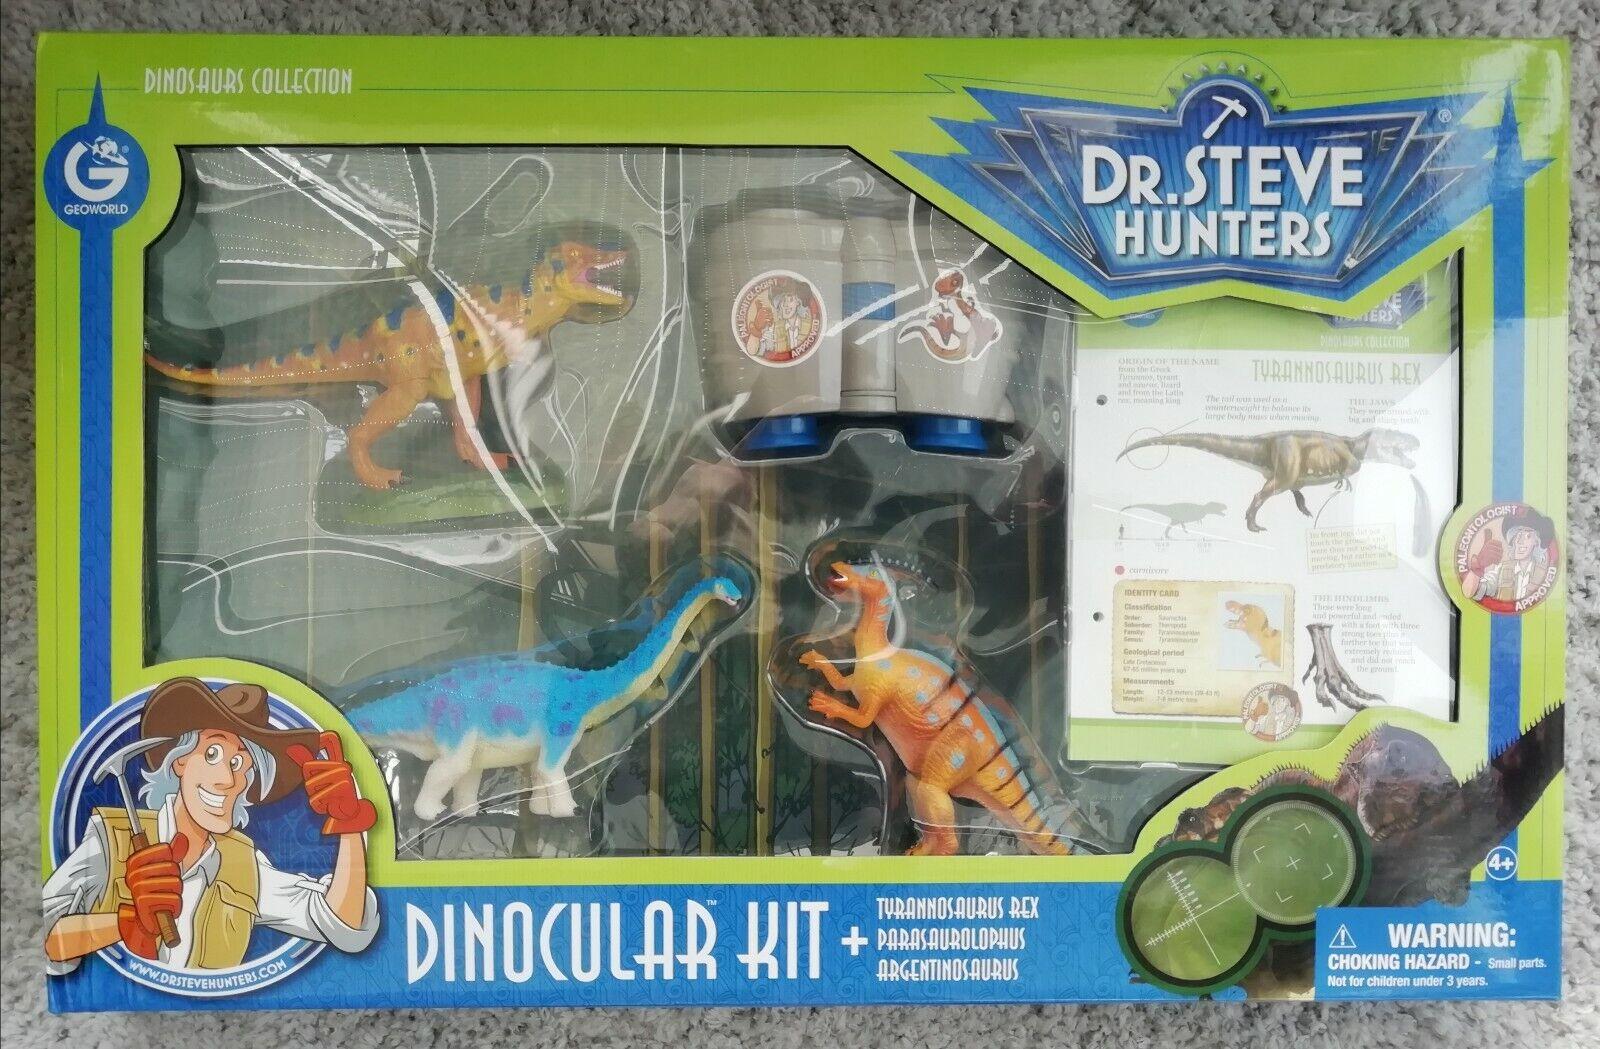 GeoWelt dinosaurs Sammlung Dr Steve Hunters. Dinocular Kit.